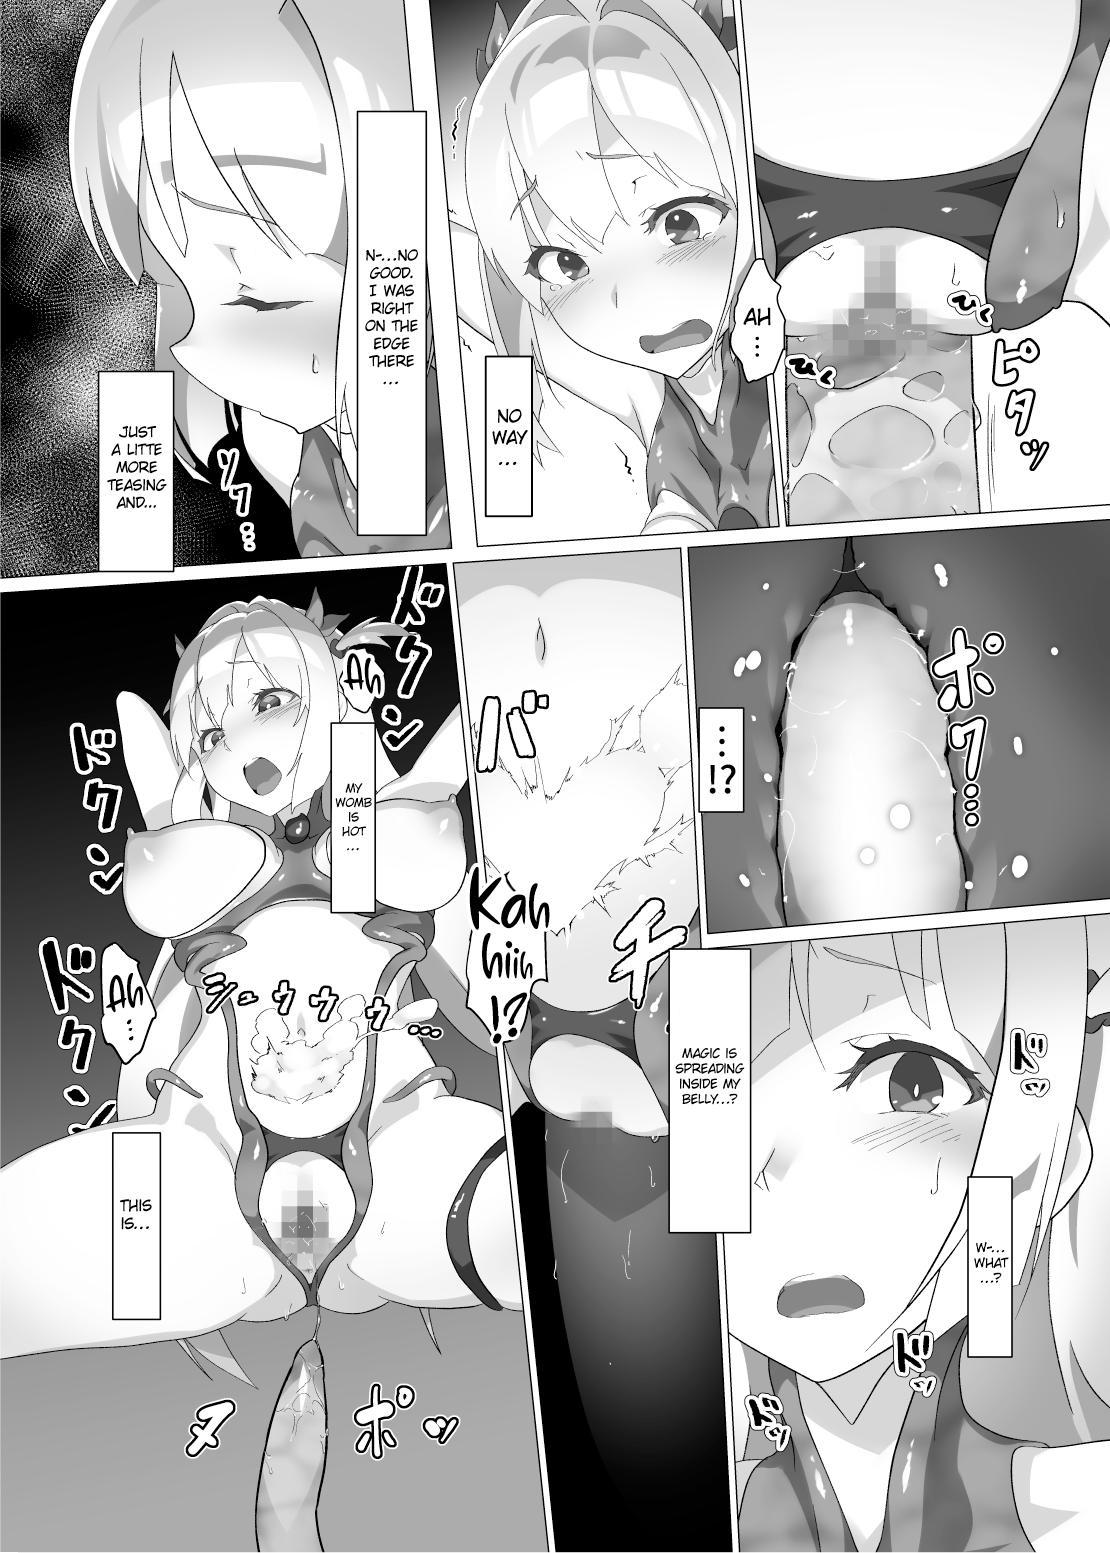 [OXIDE_Lab (OXIDEENGINE)] Kotohana 2 -Sei Shinkan Shokusou Bounyuu Kaizou-   Unusual Flower 2 -The Holy Priestess' Breasts Expansion Tentacle Torture- [English] [cutegyaruTL] [Digital] 21